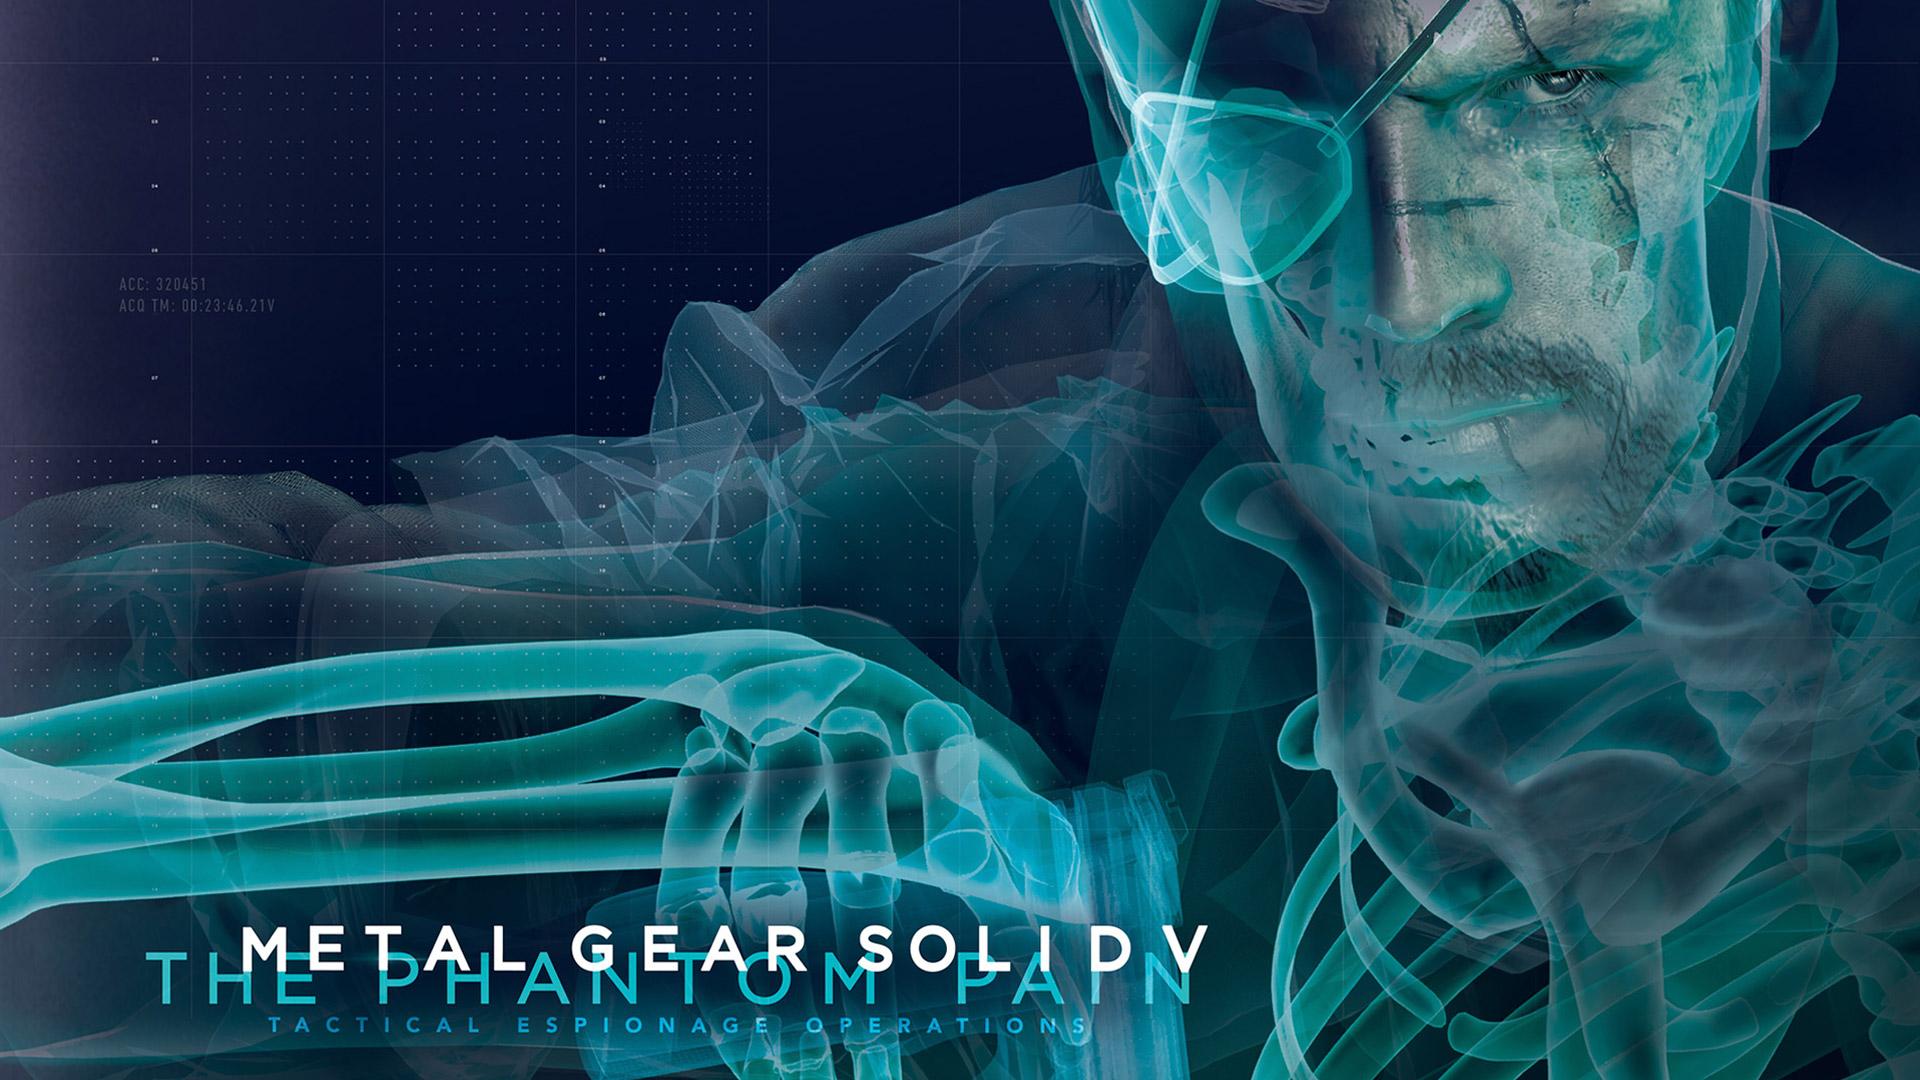 Free Metal Gear Solid V: The Phantom Pain Wallpaper in 1920x1080